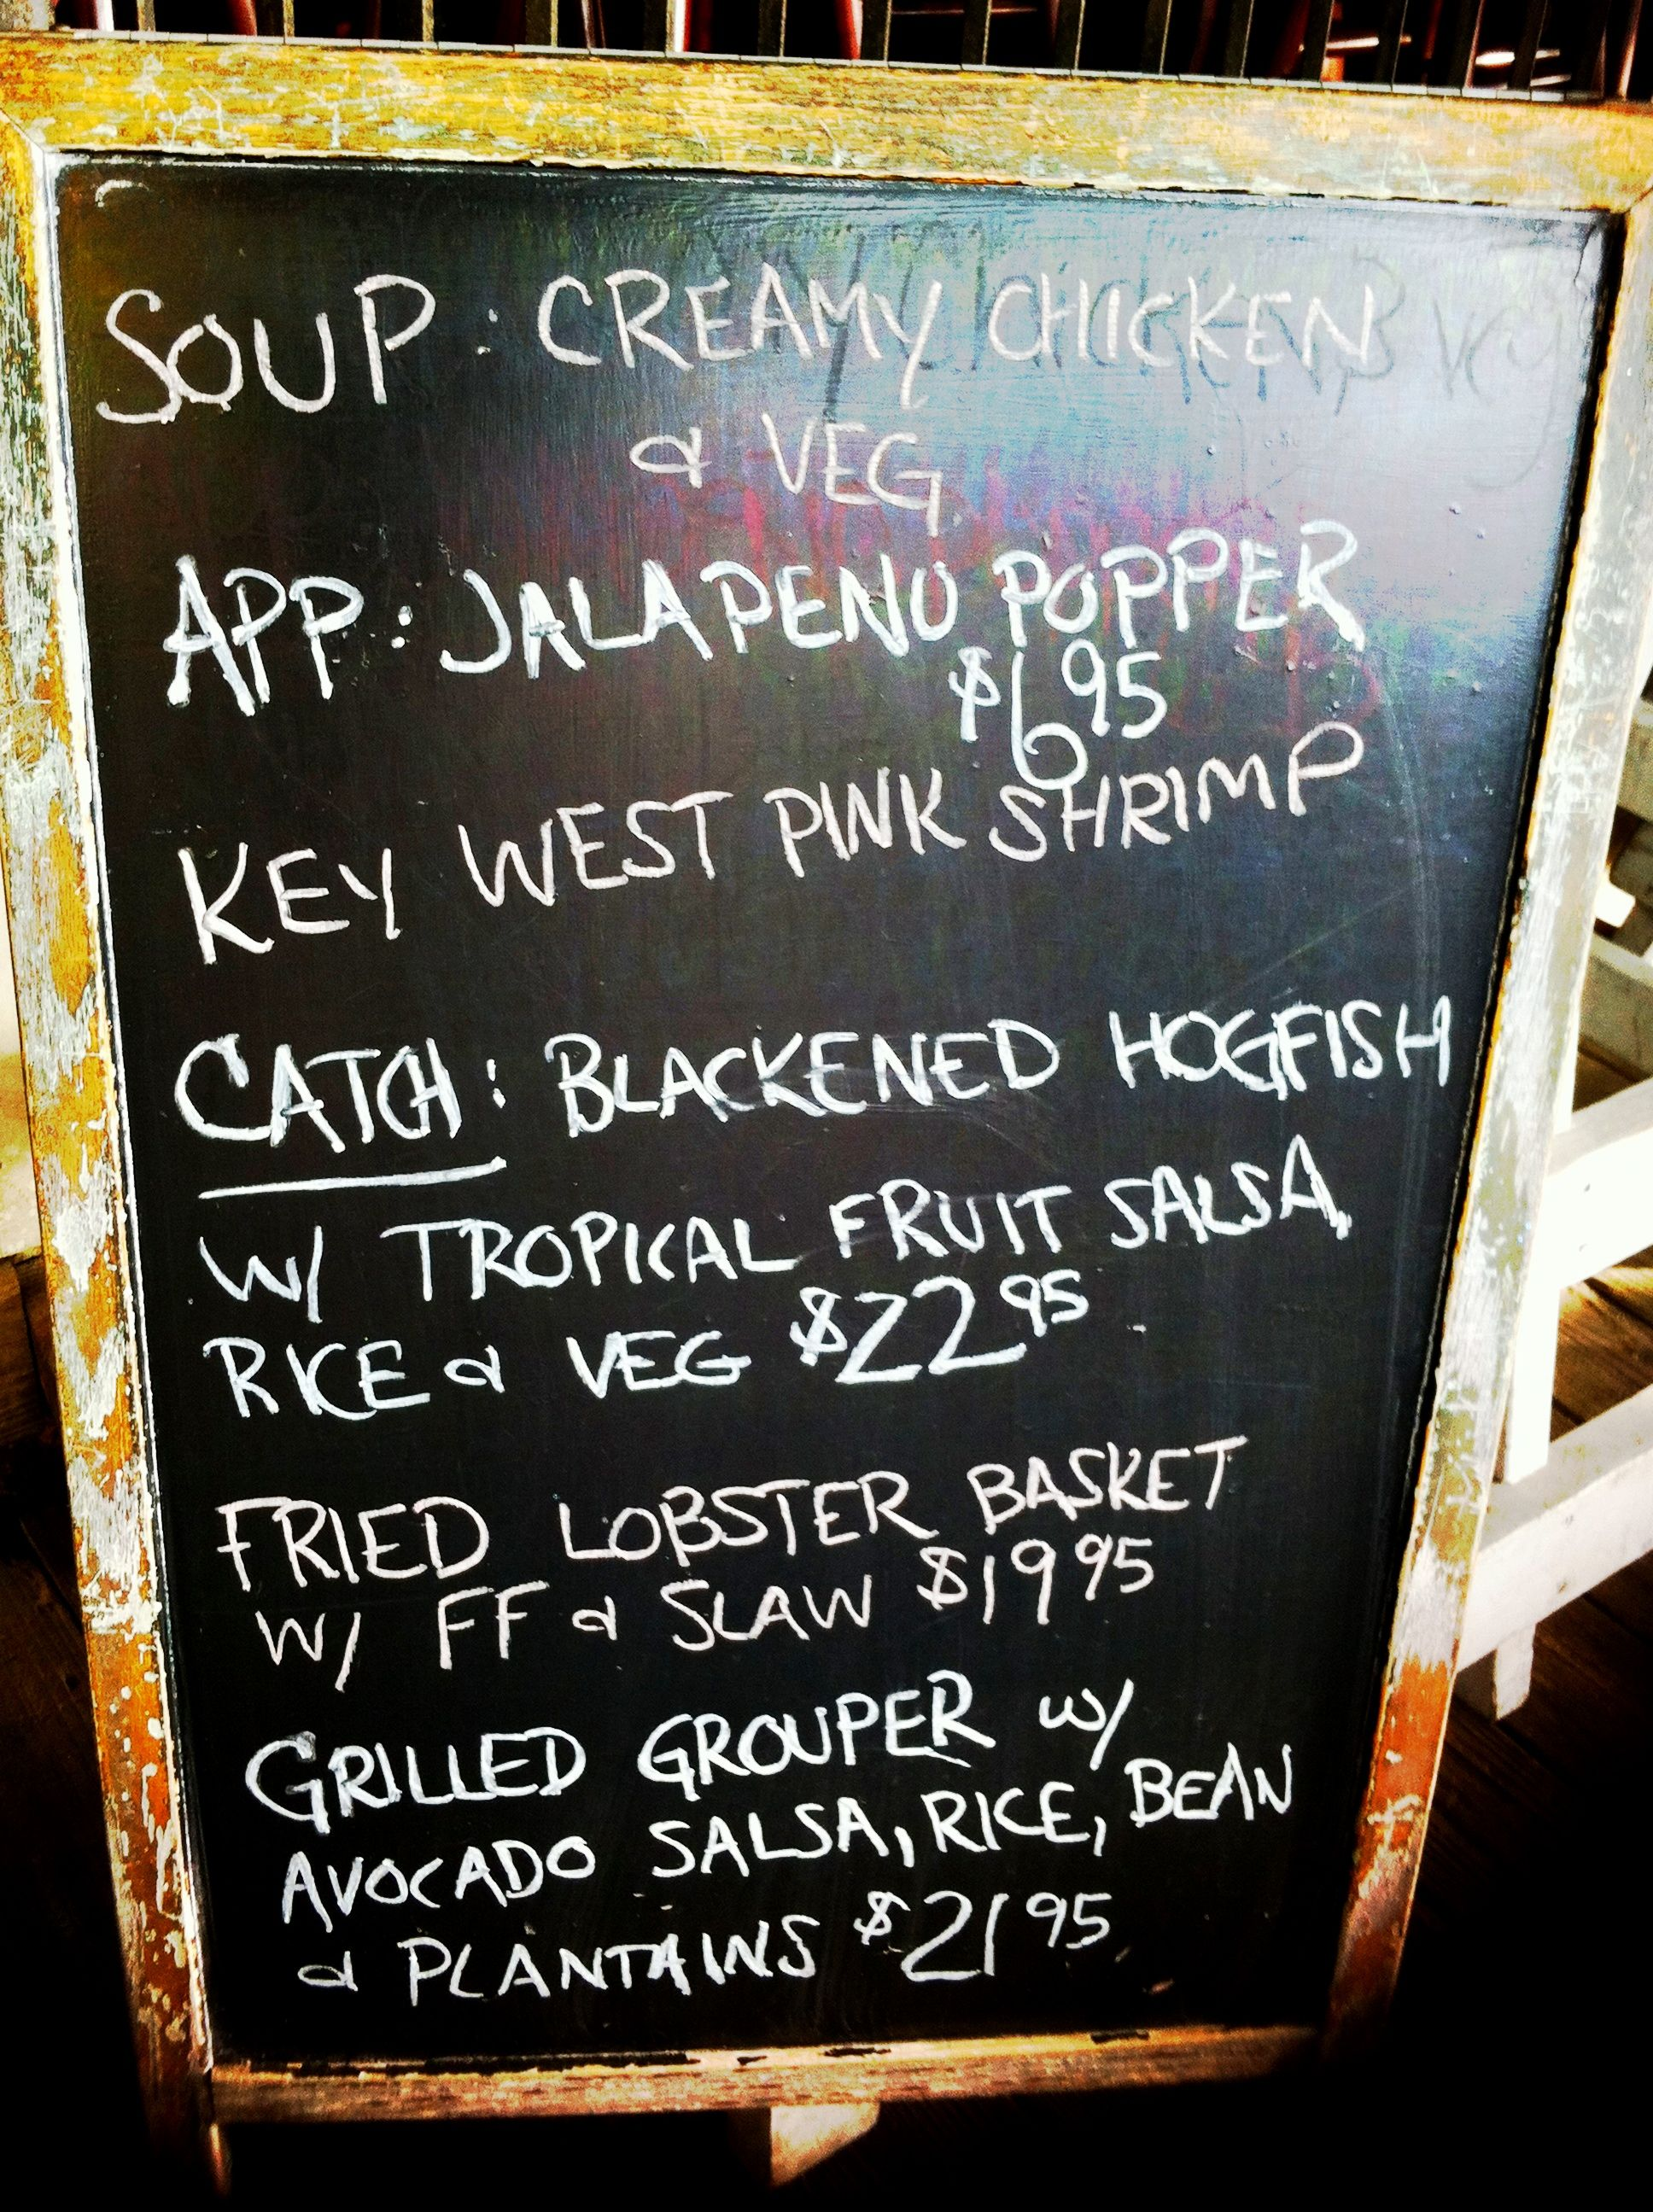 Having lunchblackboard menu, Key West, Florida